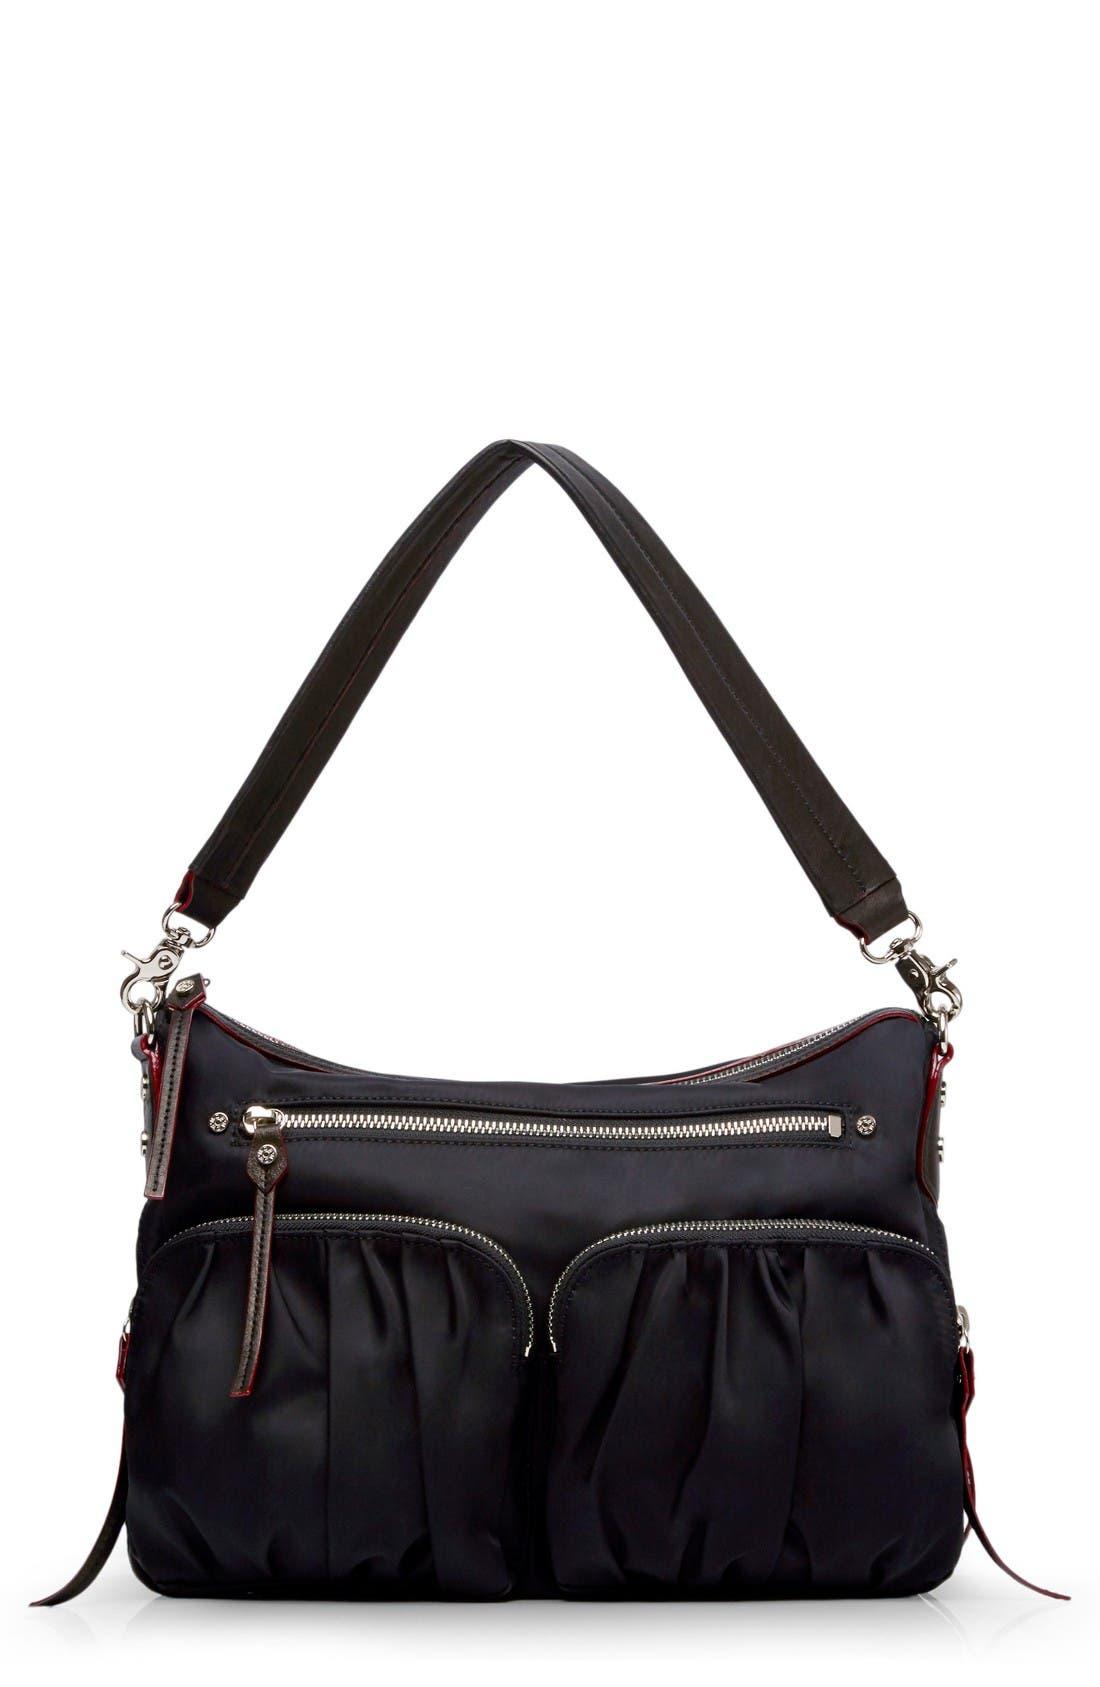 Alternate Image 1 Selected - MZ Wallace 'Hayley' Bedford Nylon Handbag